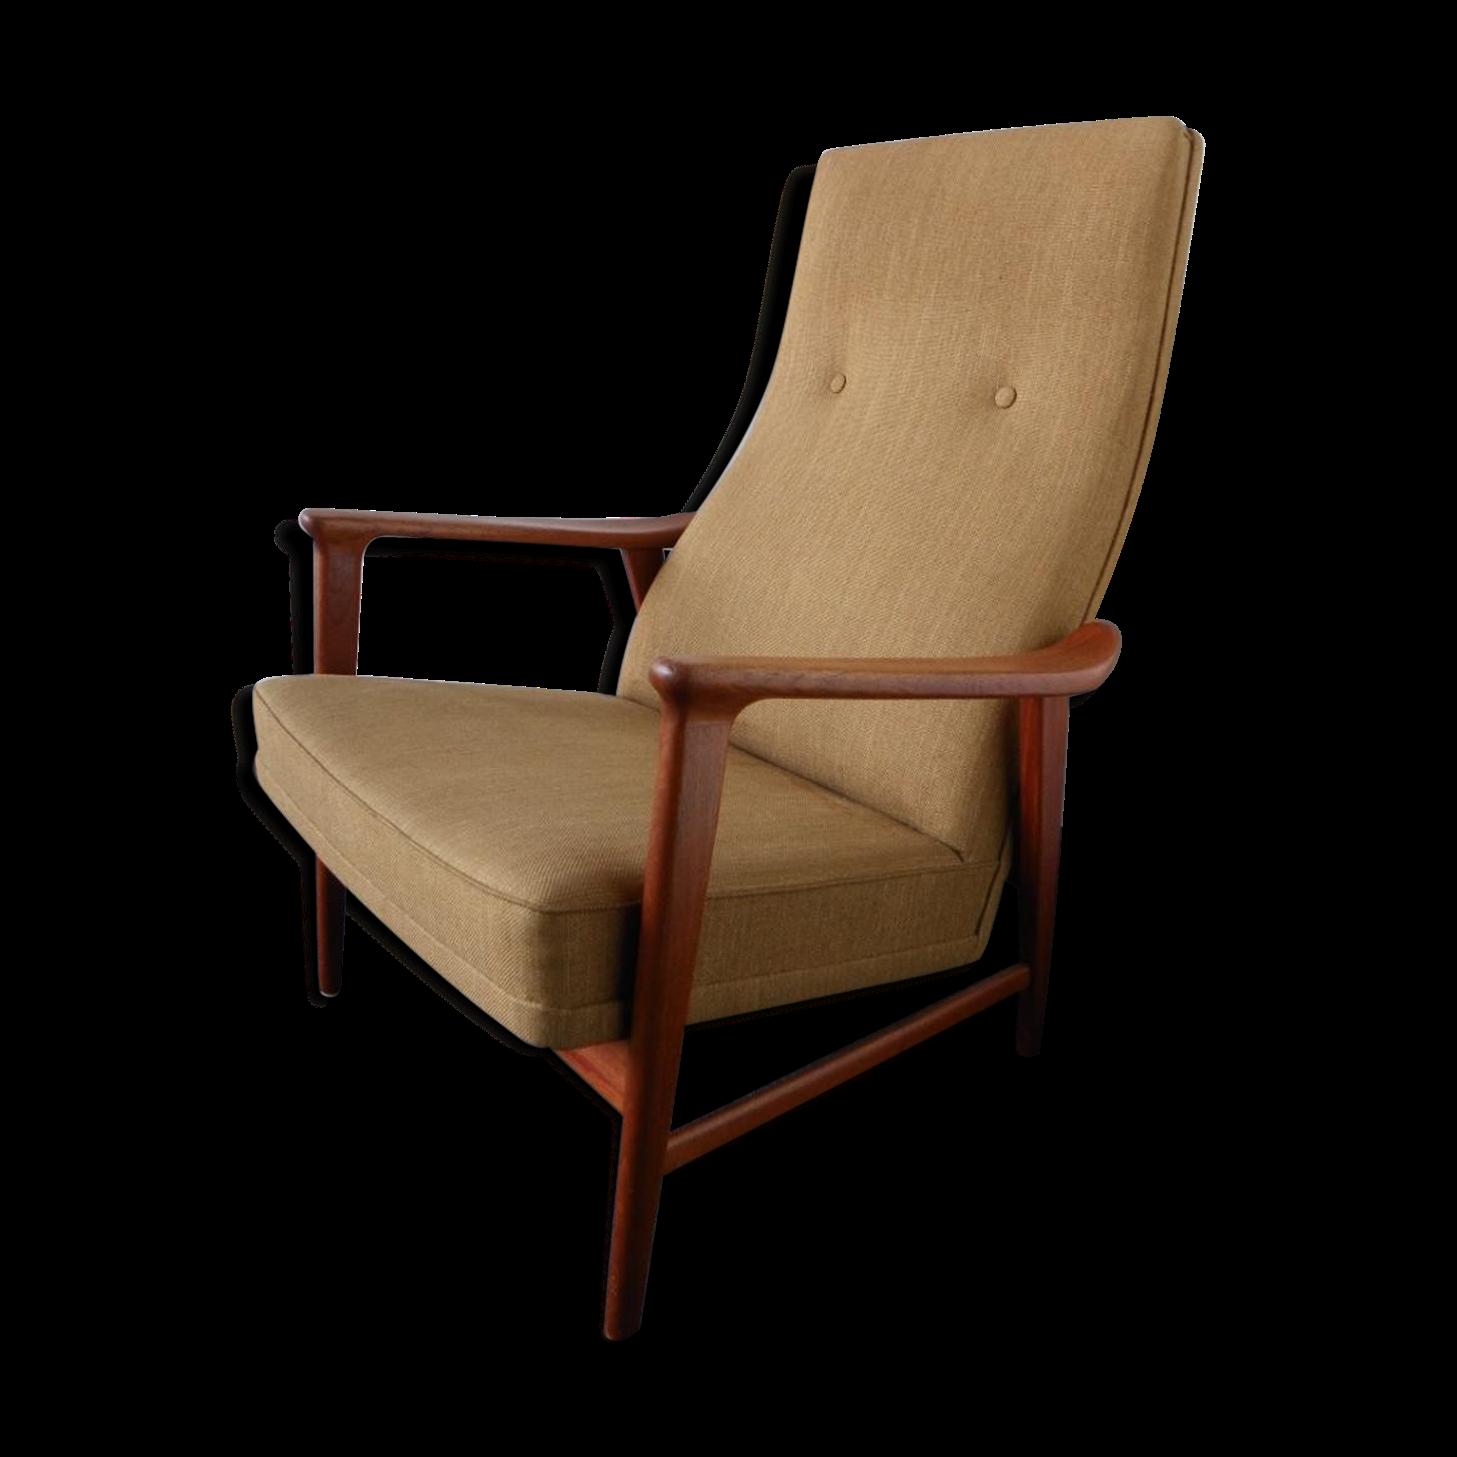 Charmant Swedish Chair 1960 S   Wood   Yellow   Scandinavian   LiyPp48